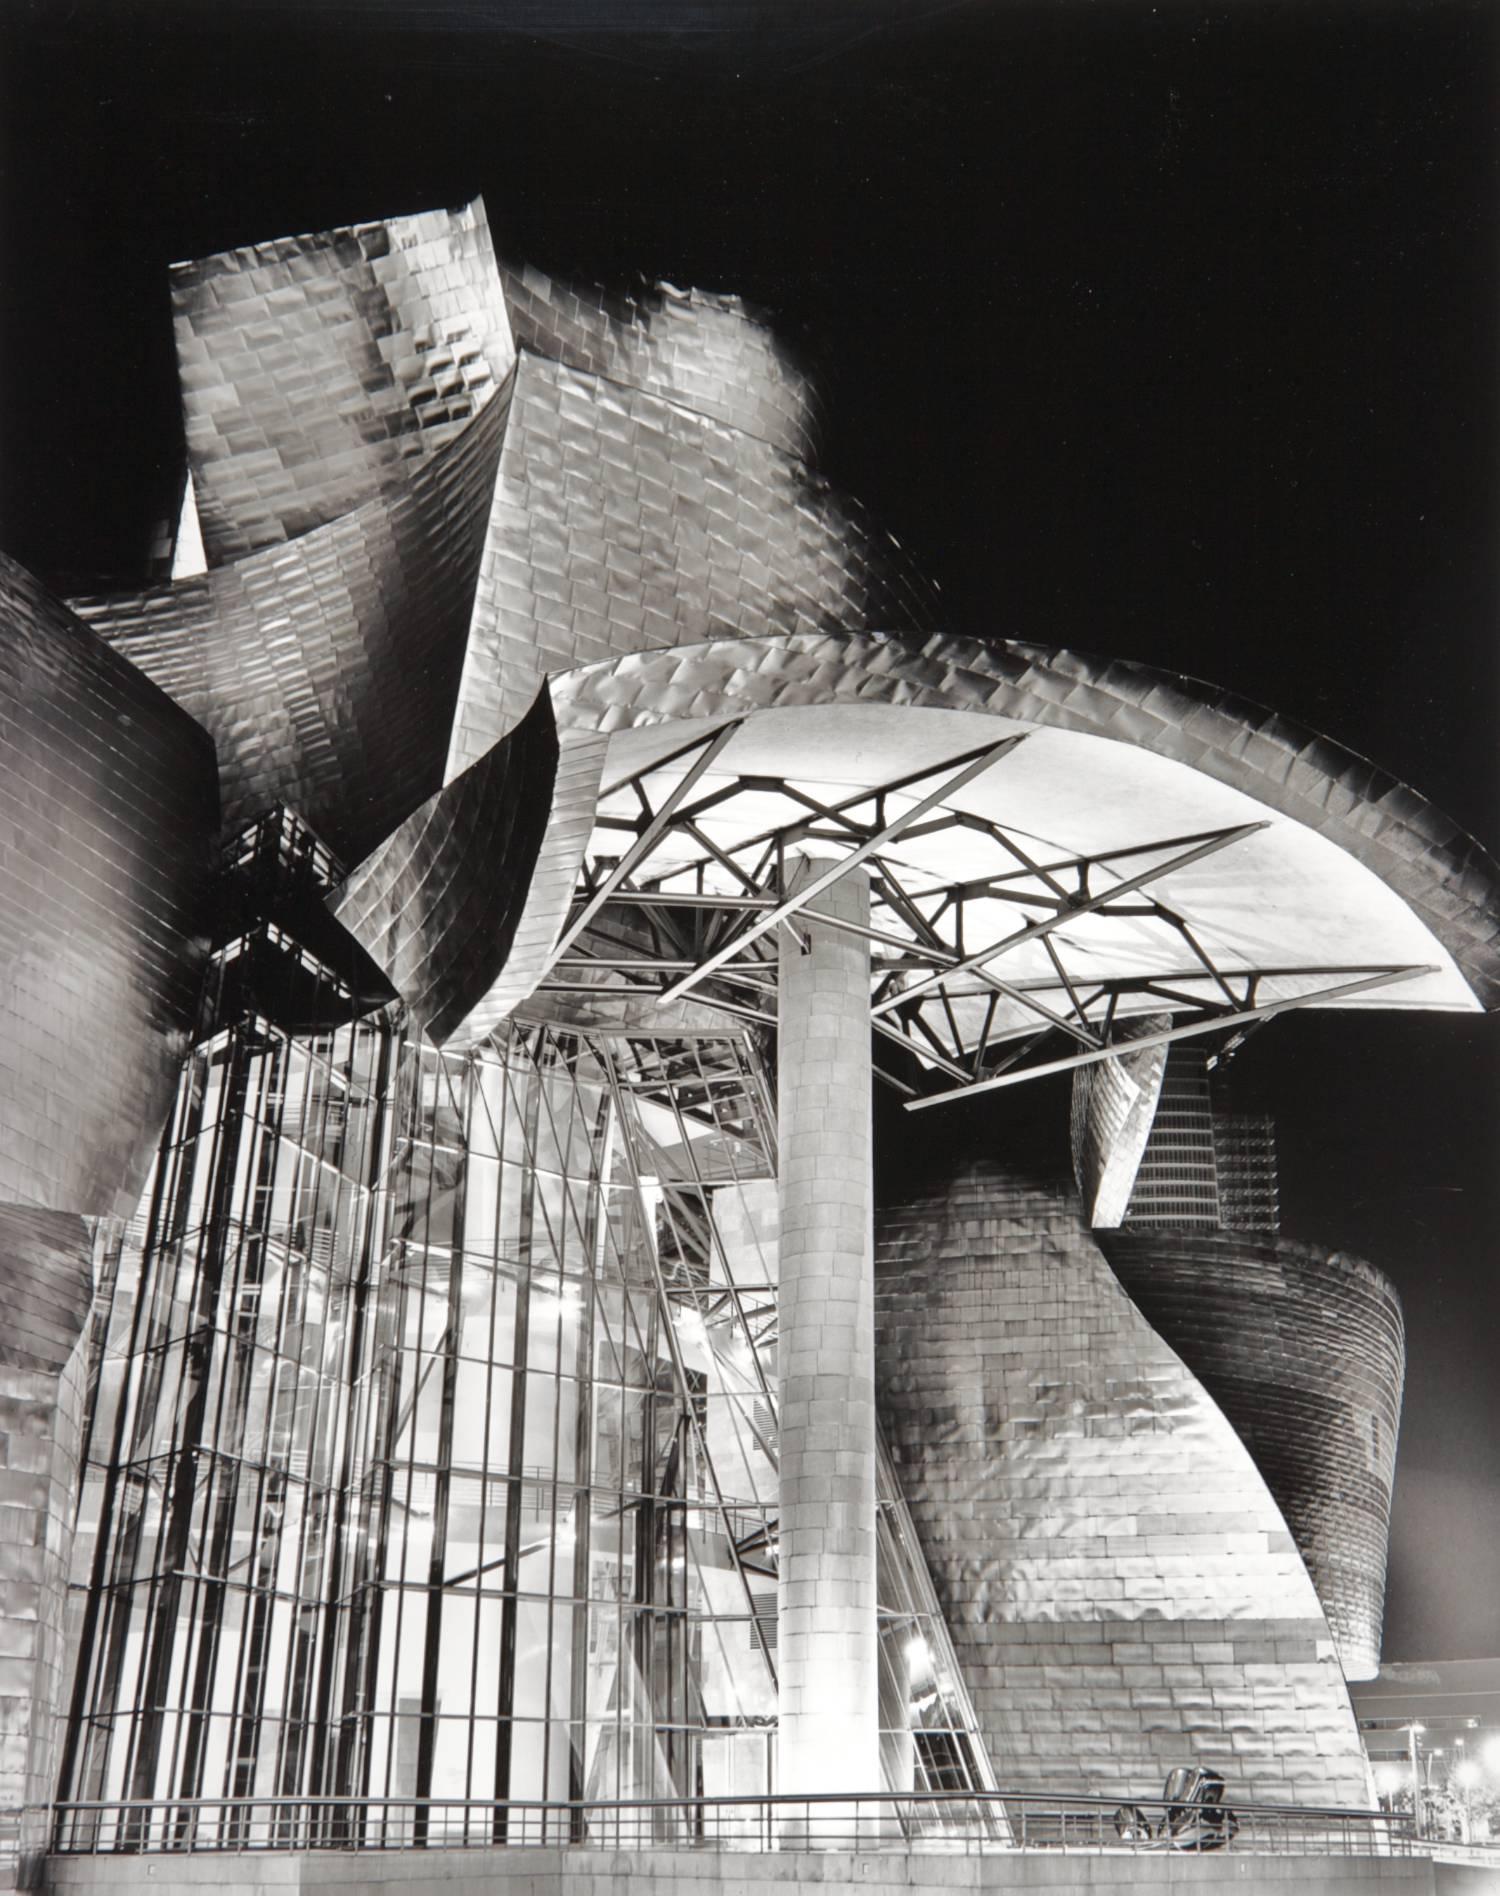 Guggenheim Column (Bilbao, Spain)